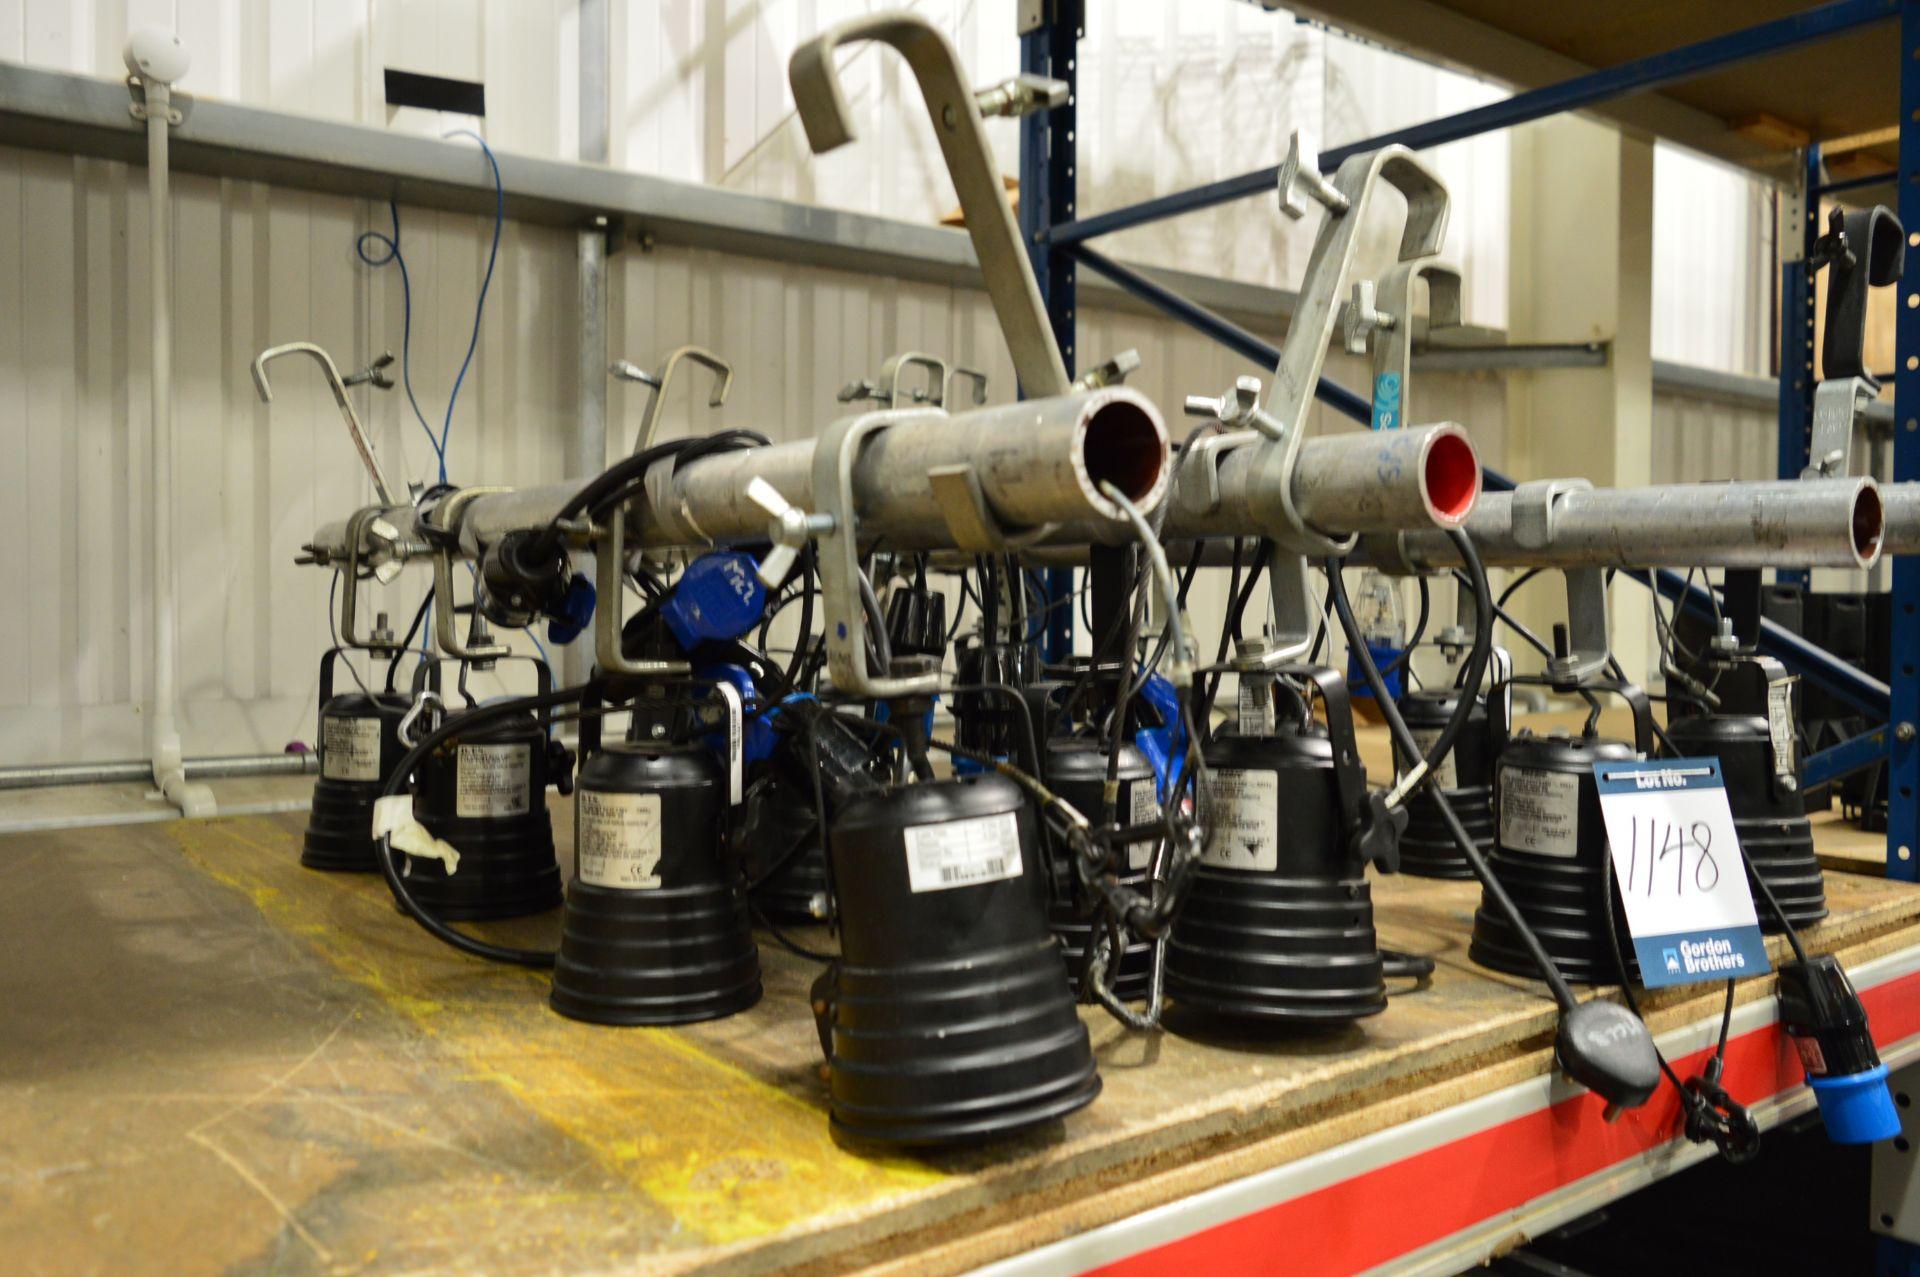 Lot 1148 - 16x No. Encore/DTS P36 short evo 230v lamps mounte